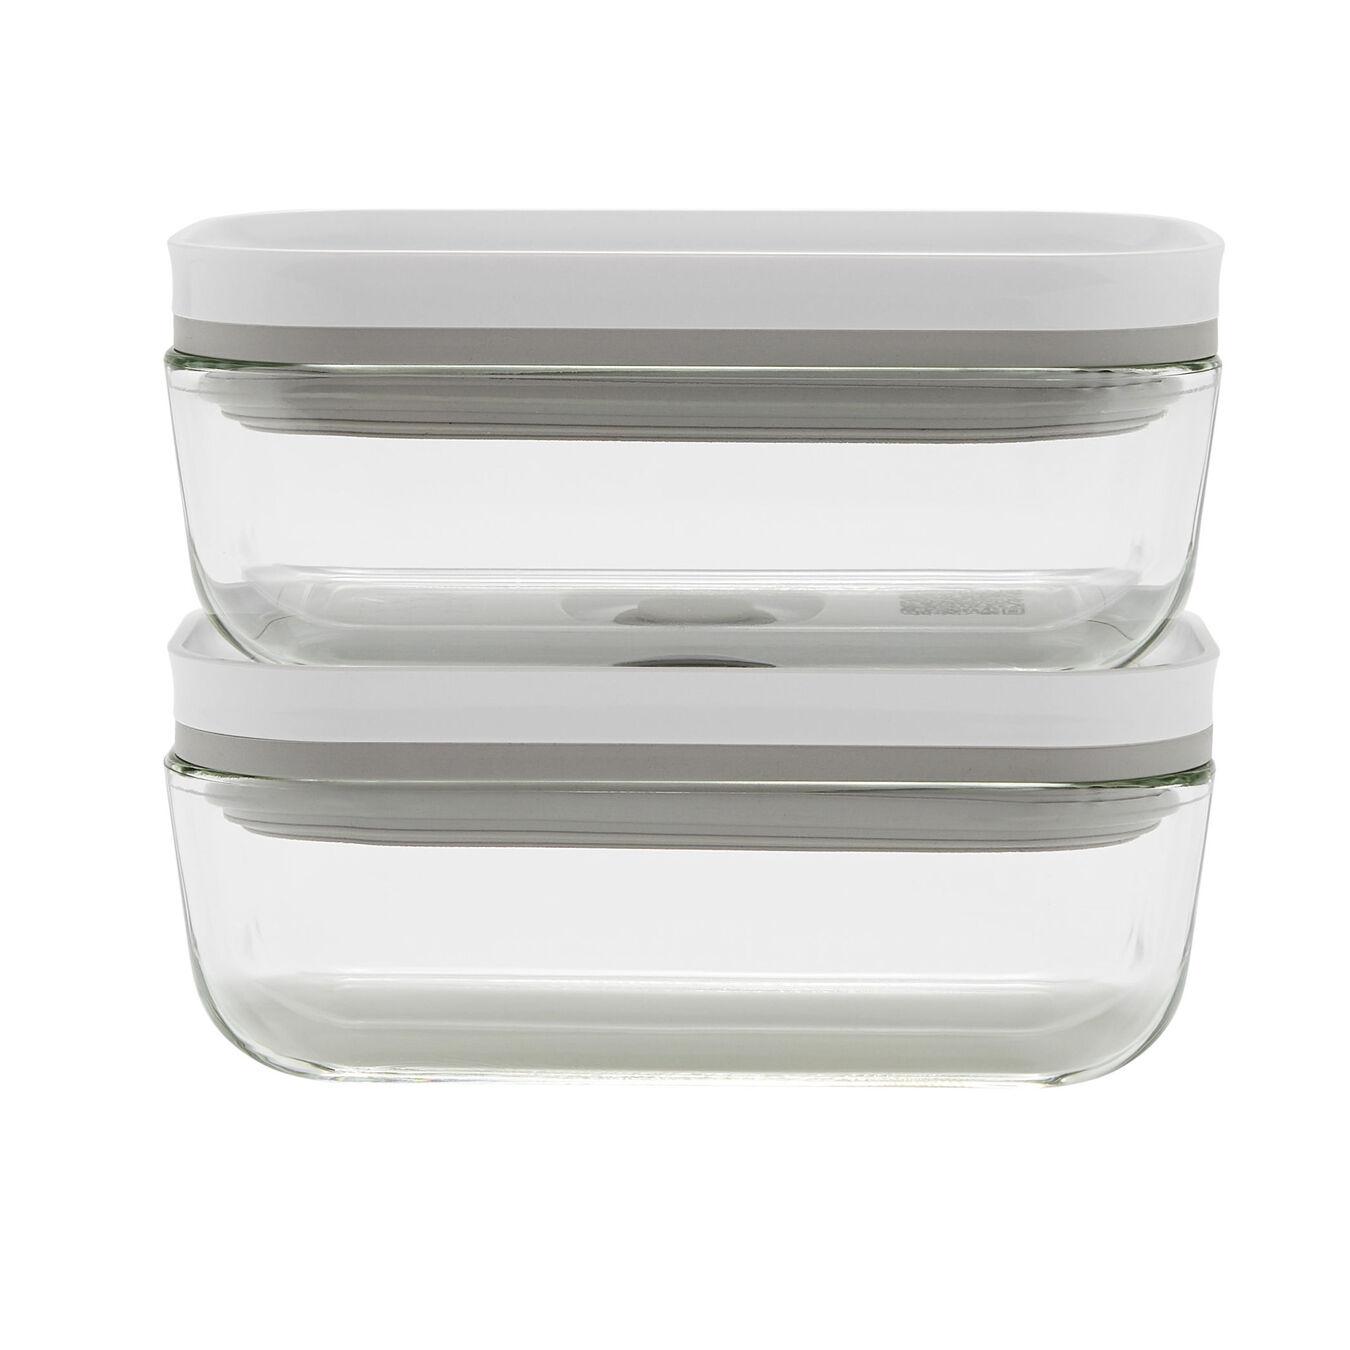 2-pc Vacuum box set, Borosilicate glass, white,,large 1